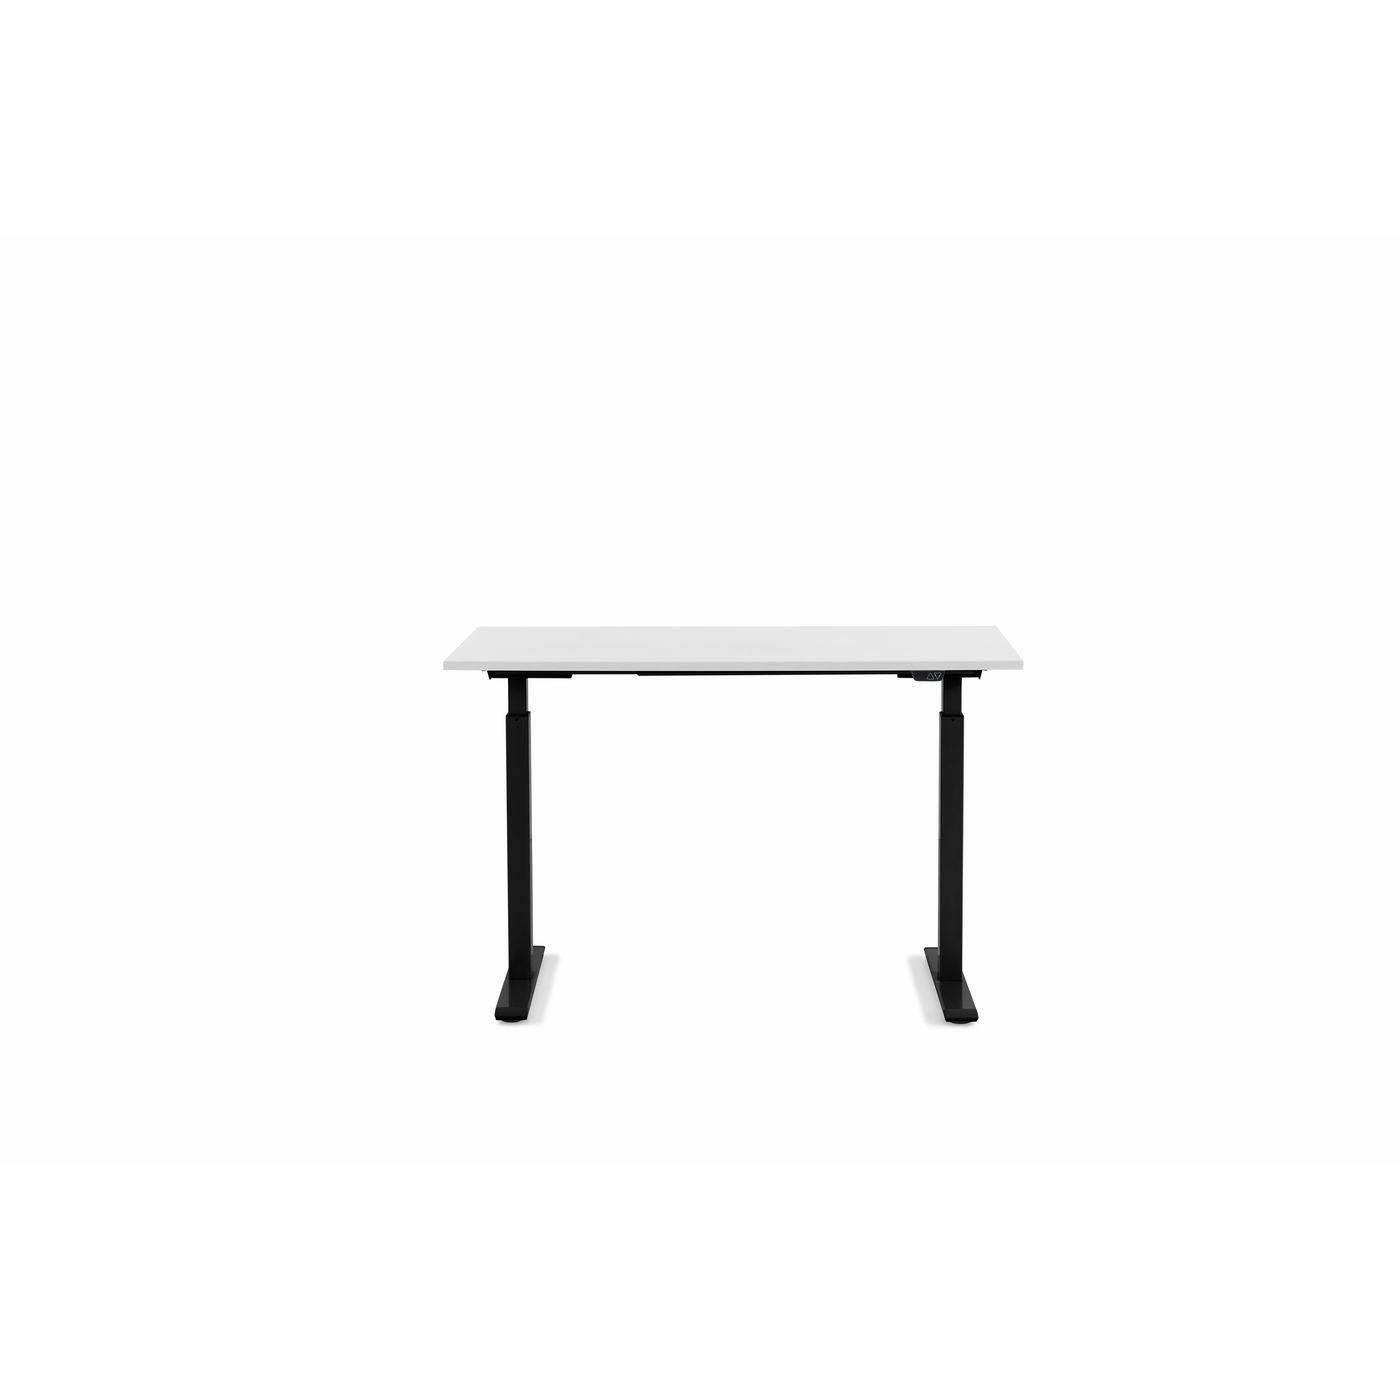 KARE DESIGN Office Smart Black White skrivebord - hvid melamin og sort stål (120x70)